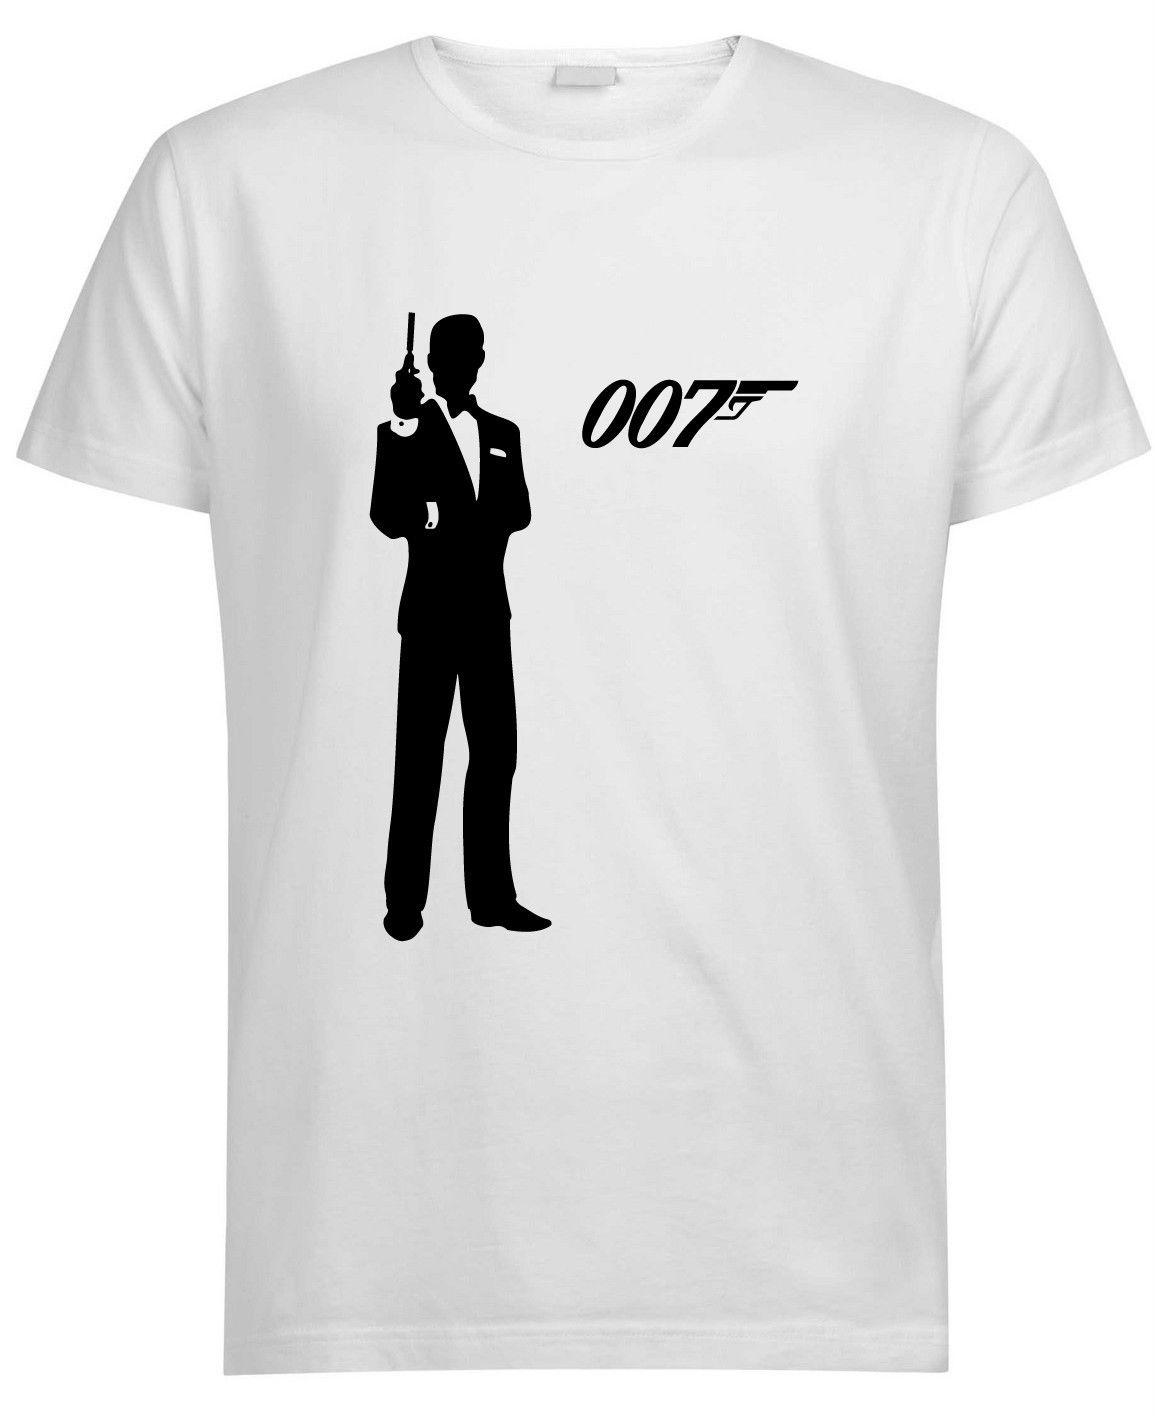 875e7f26 James Bond 007 T Shirt Retro Fancy Dress 80s All Sizes Funny Unisex Casual  Tshirt Gift T Shirt Over Shirt Best T Shirt Site From Wildmarkstore, ...